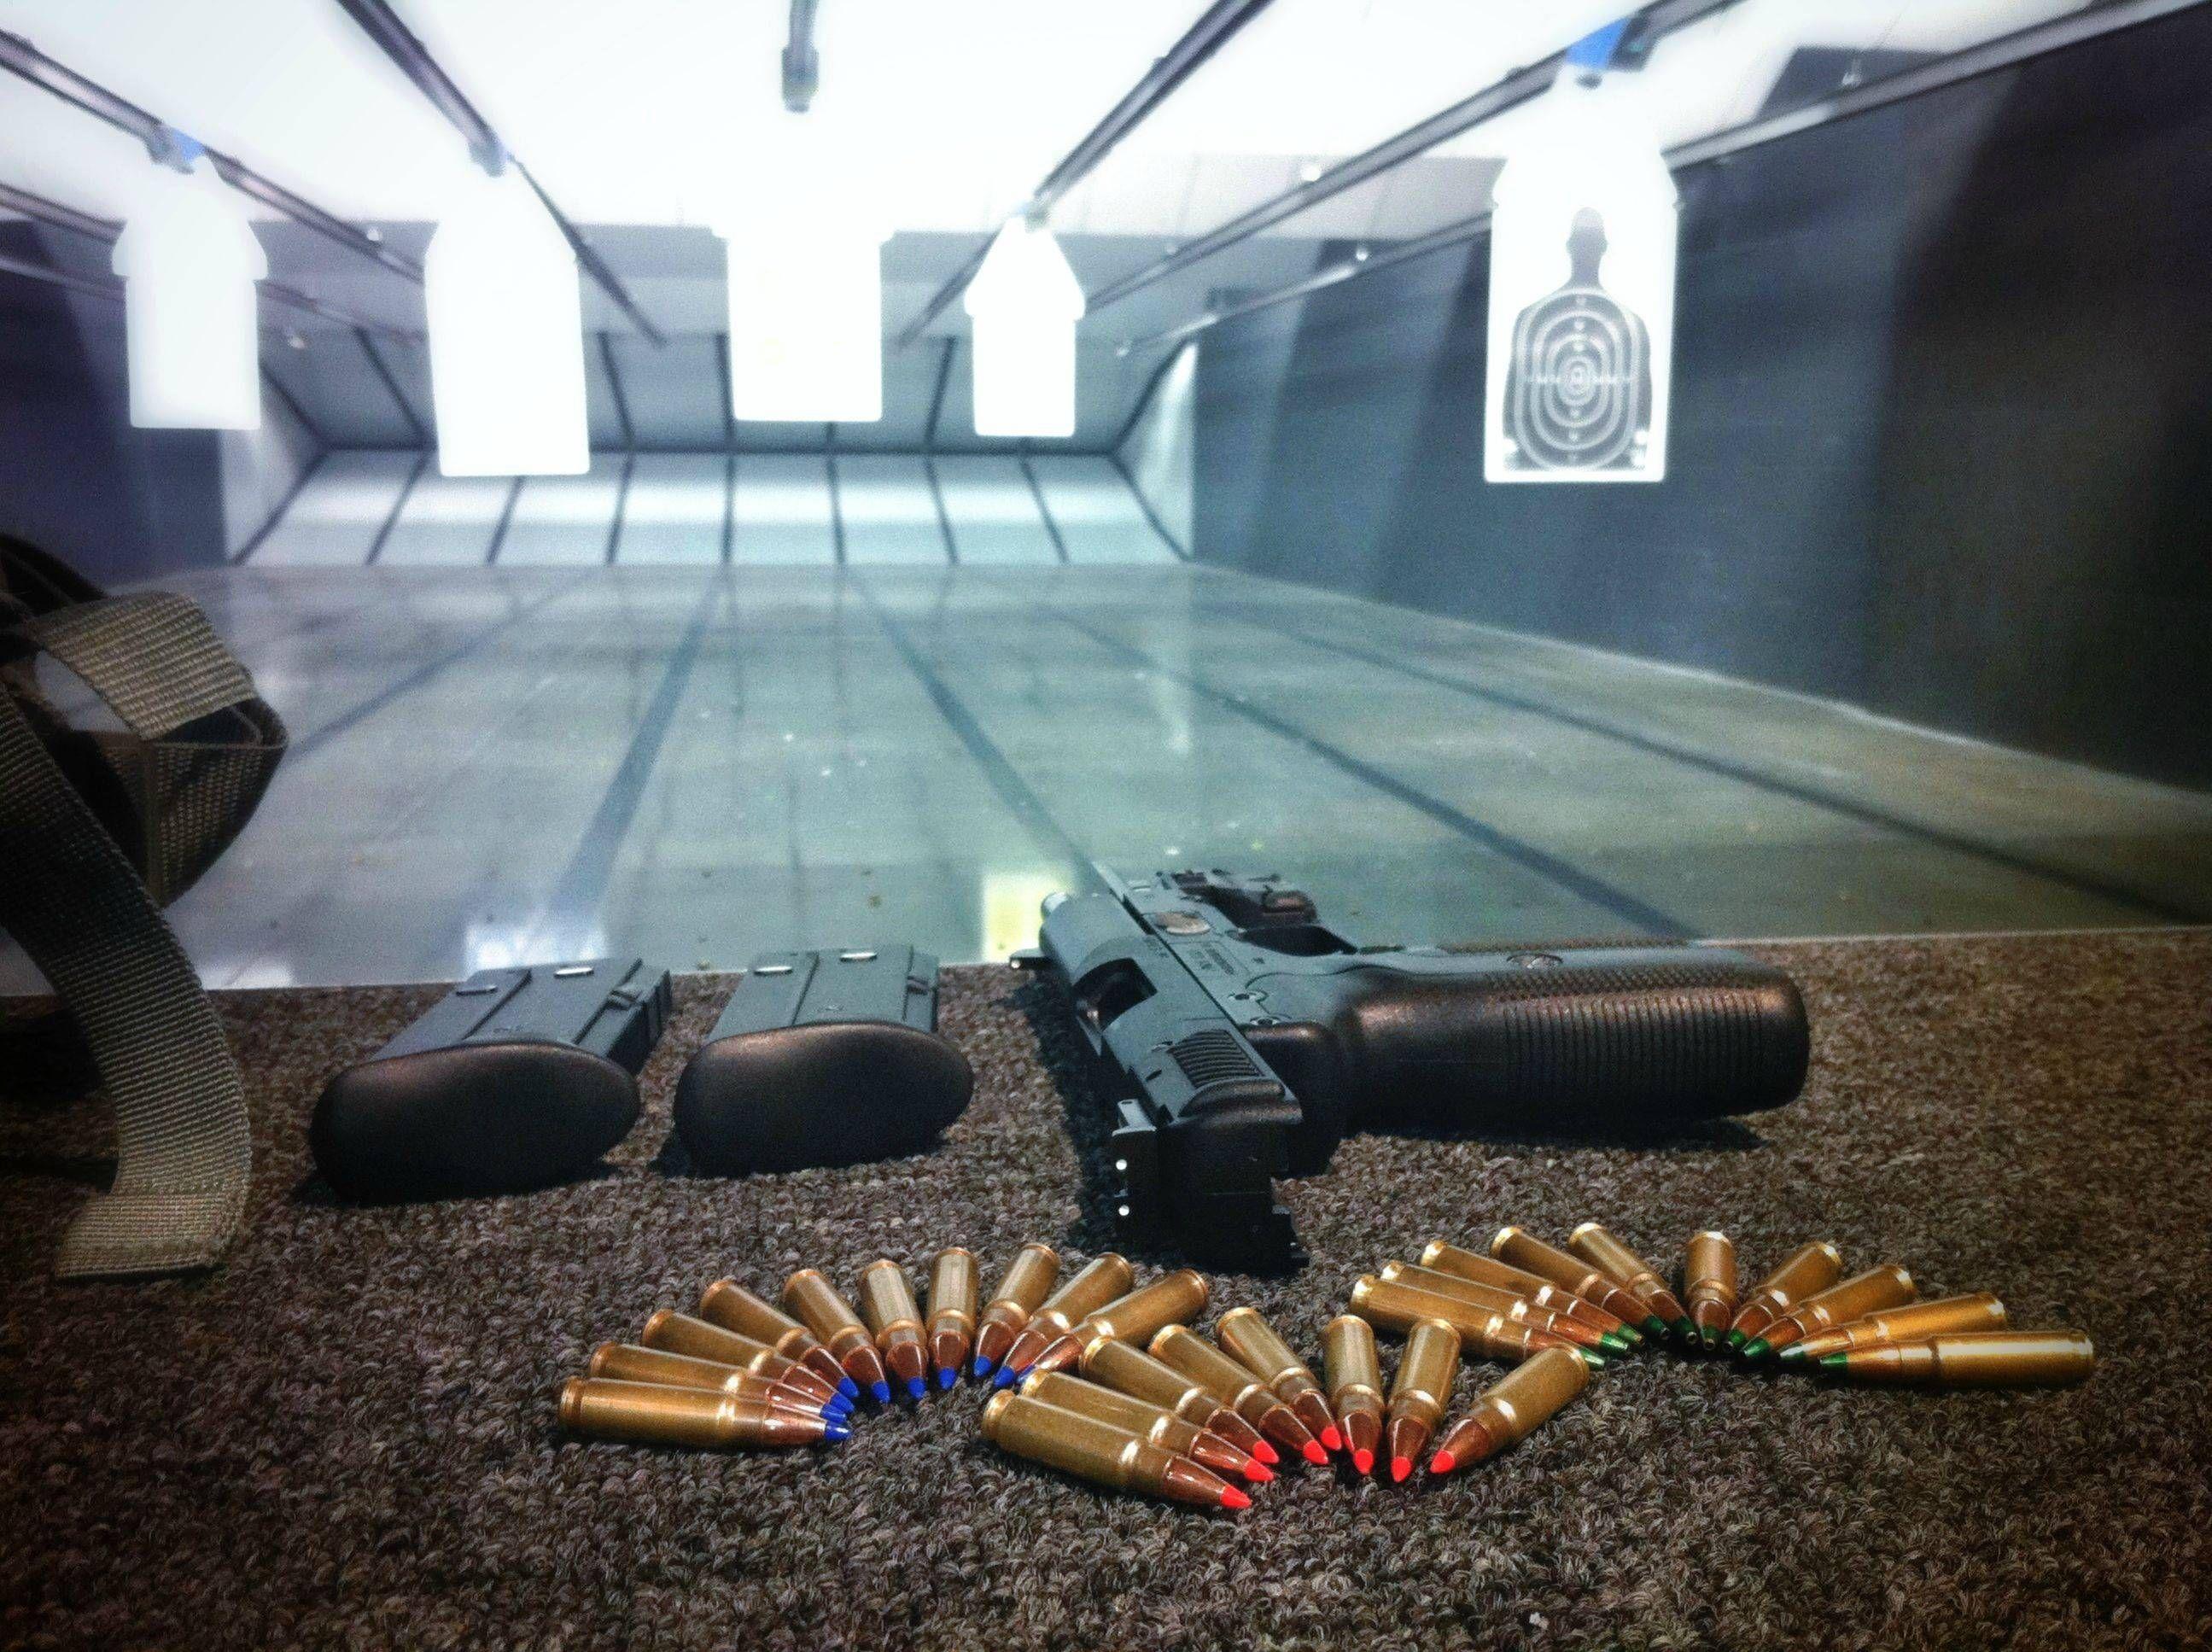 Fn Five Seven 5 7 Pistol Pistol Guns And Ammo Ammunition